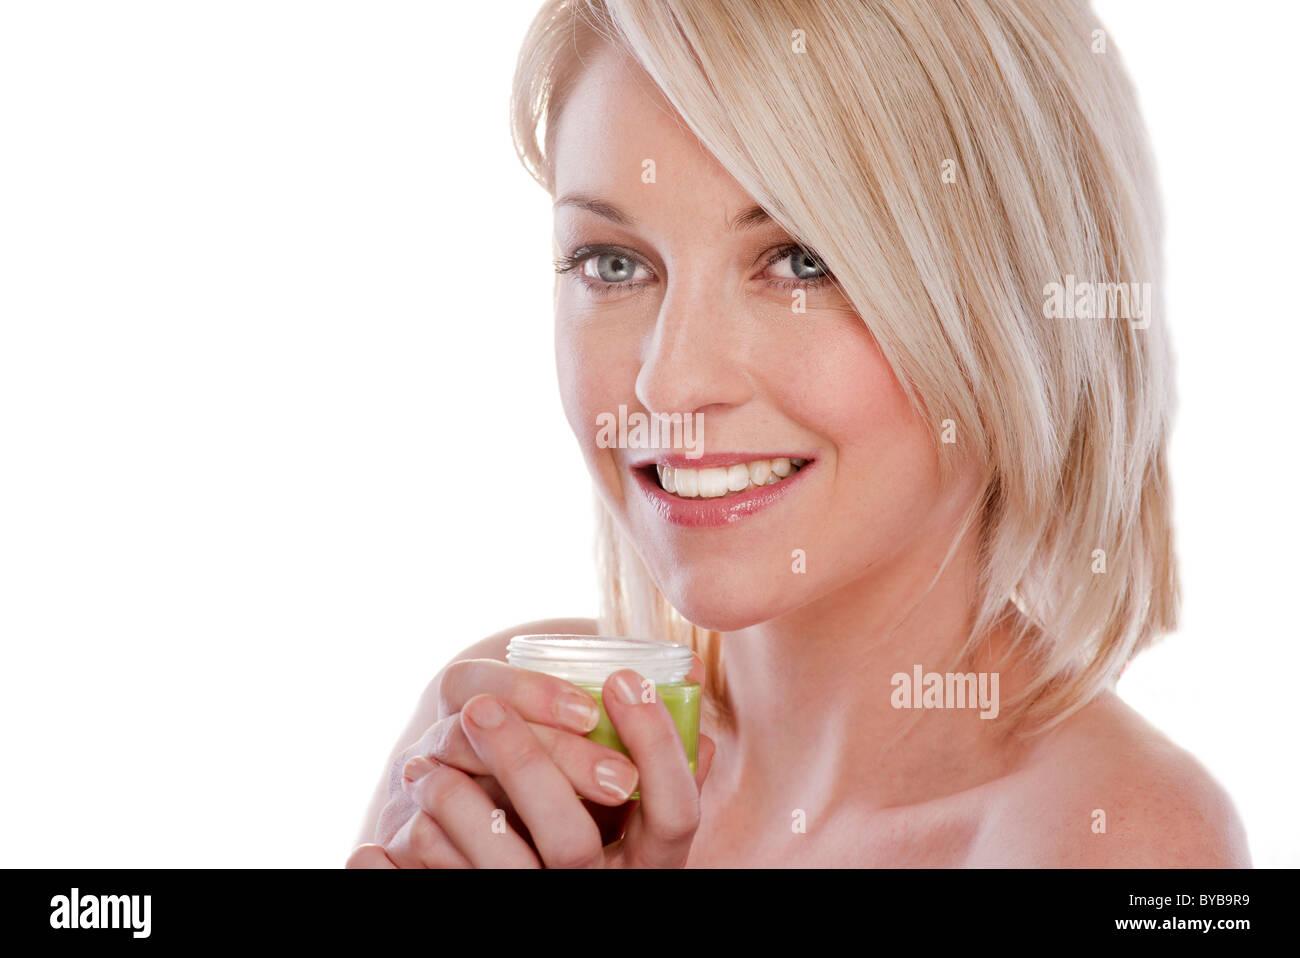 blonde woman holding jar of face cream skincare - Stock Image